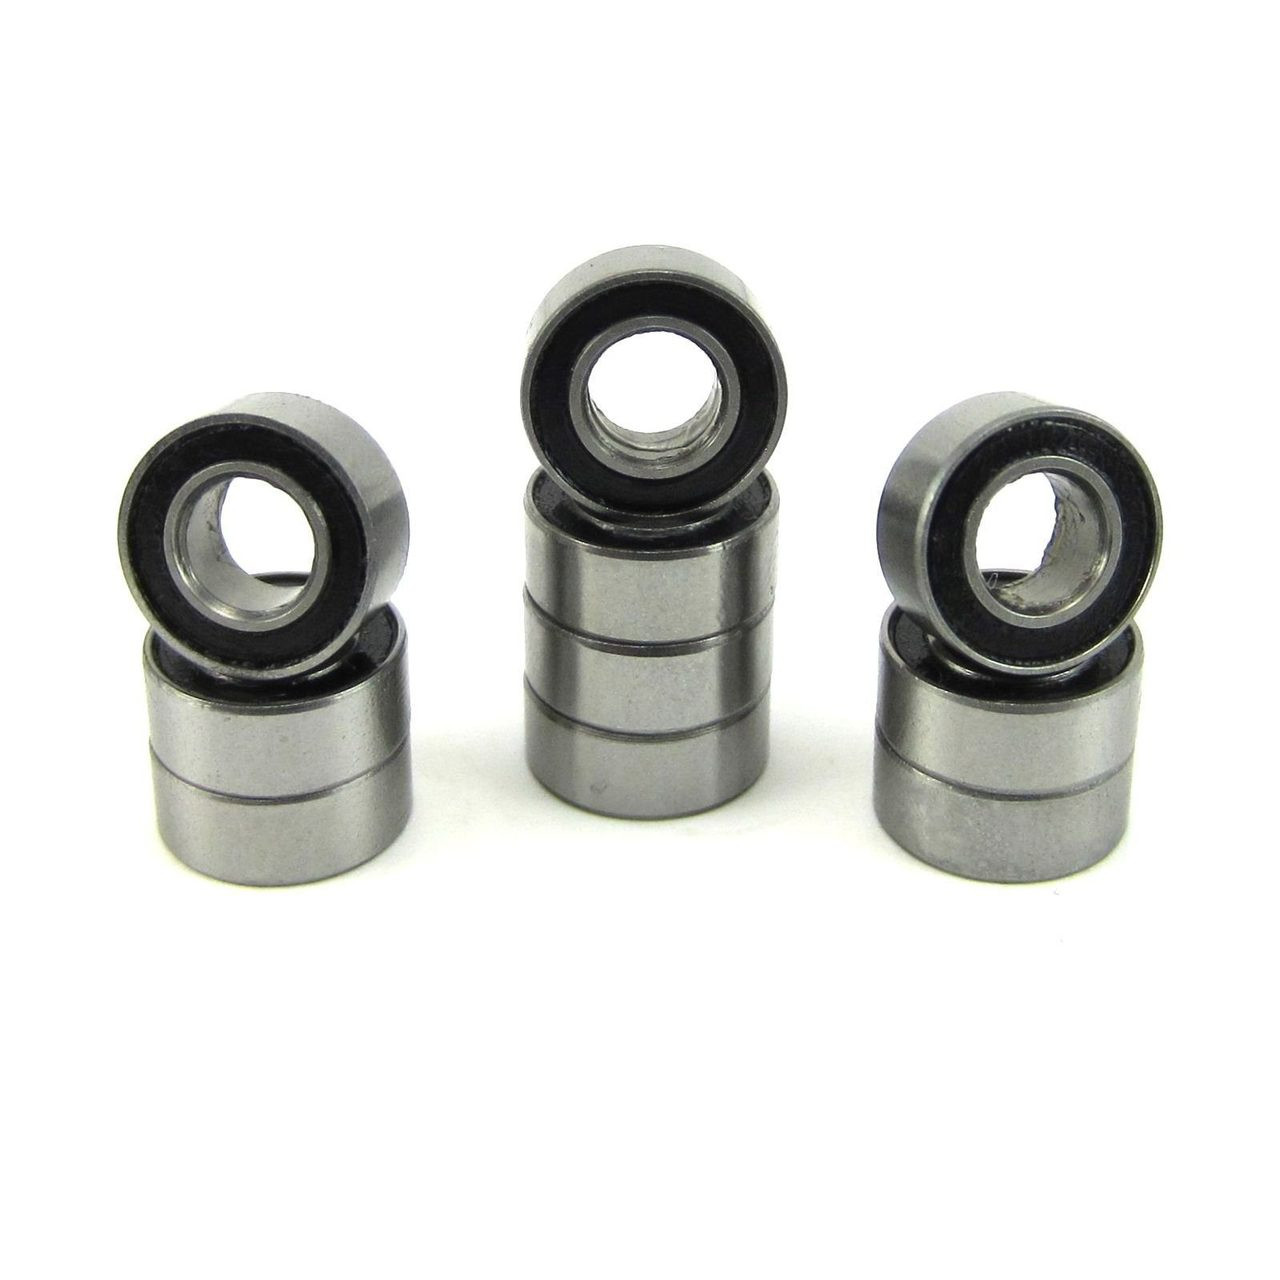 TRB RC 5x10x4mm Precision Clutch Ball Bearings Rubber Sealed (10)